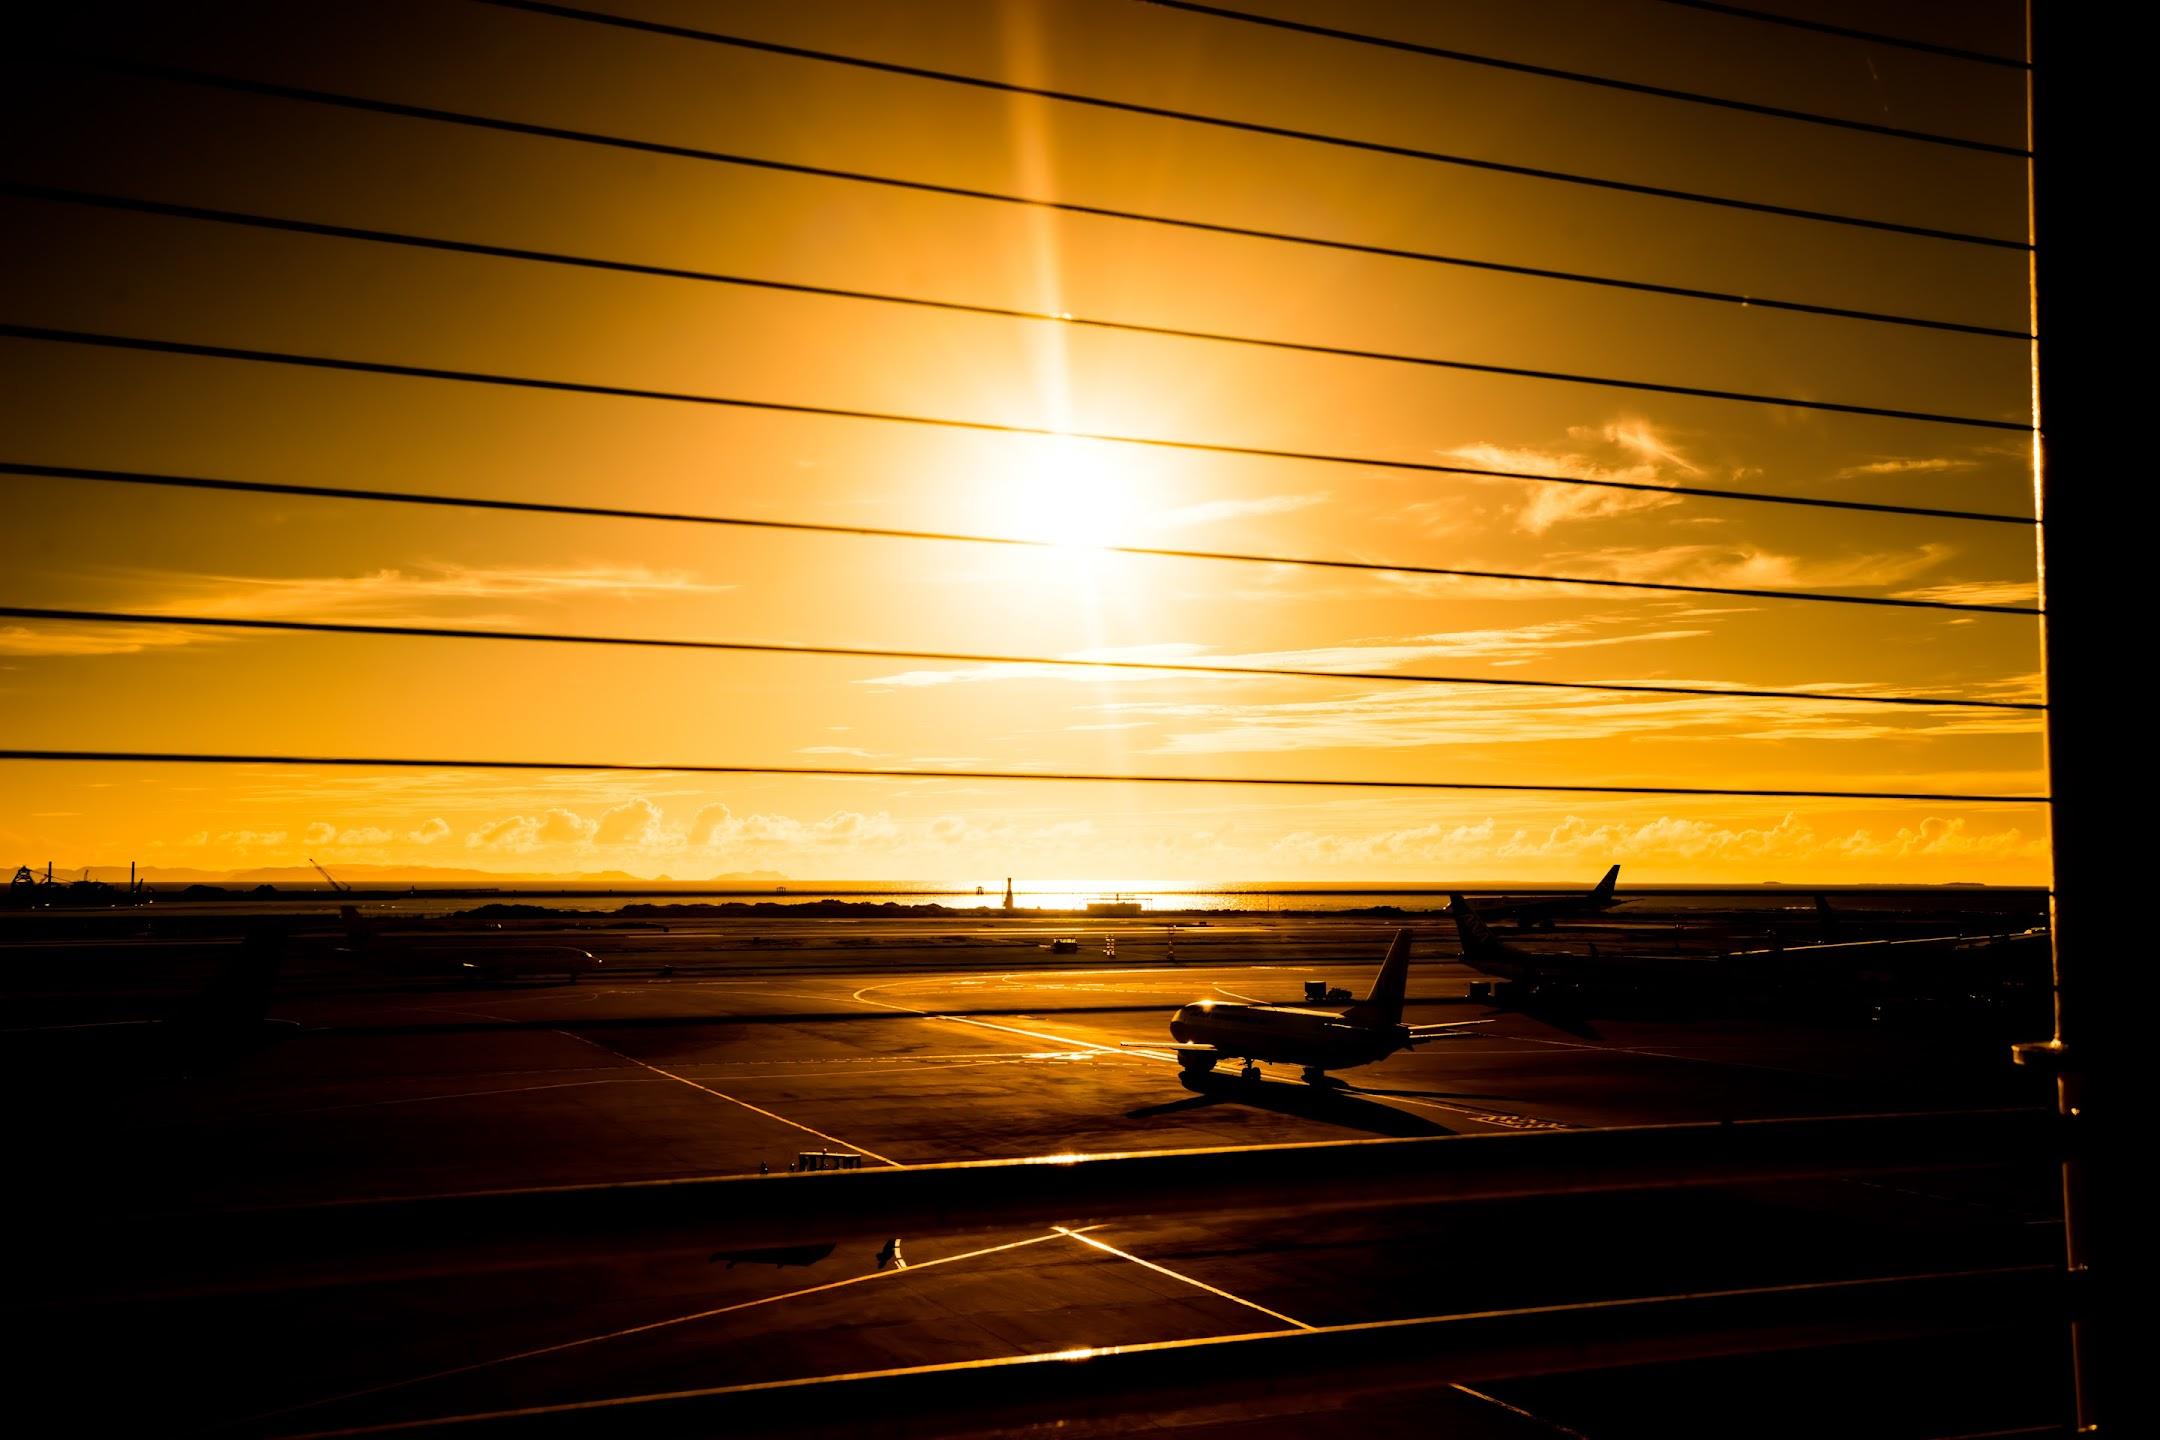 Okinawa Naha airport airplane2